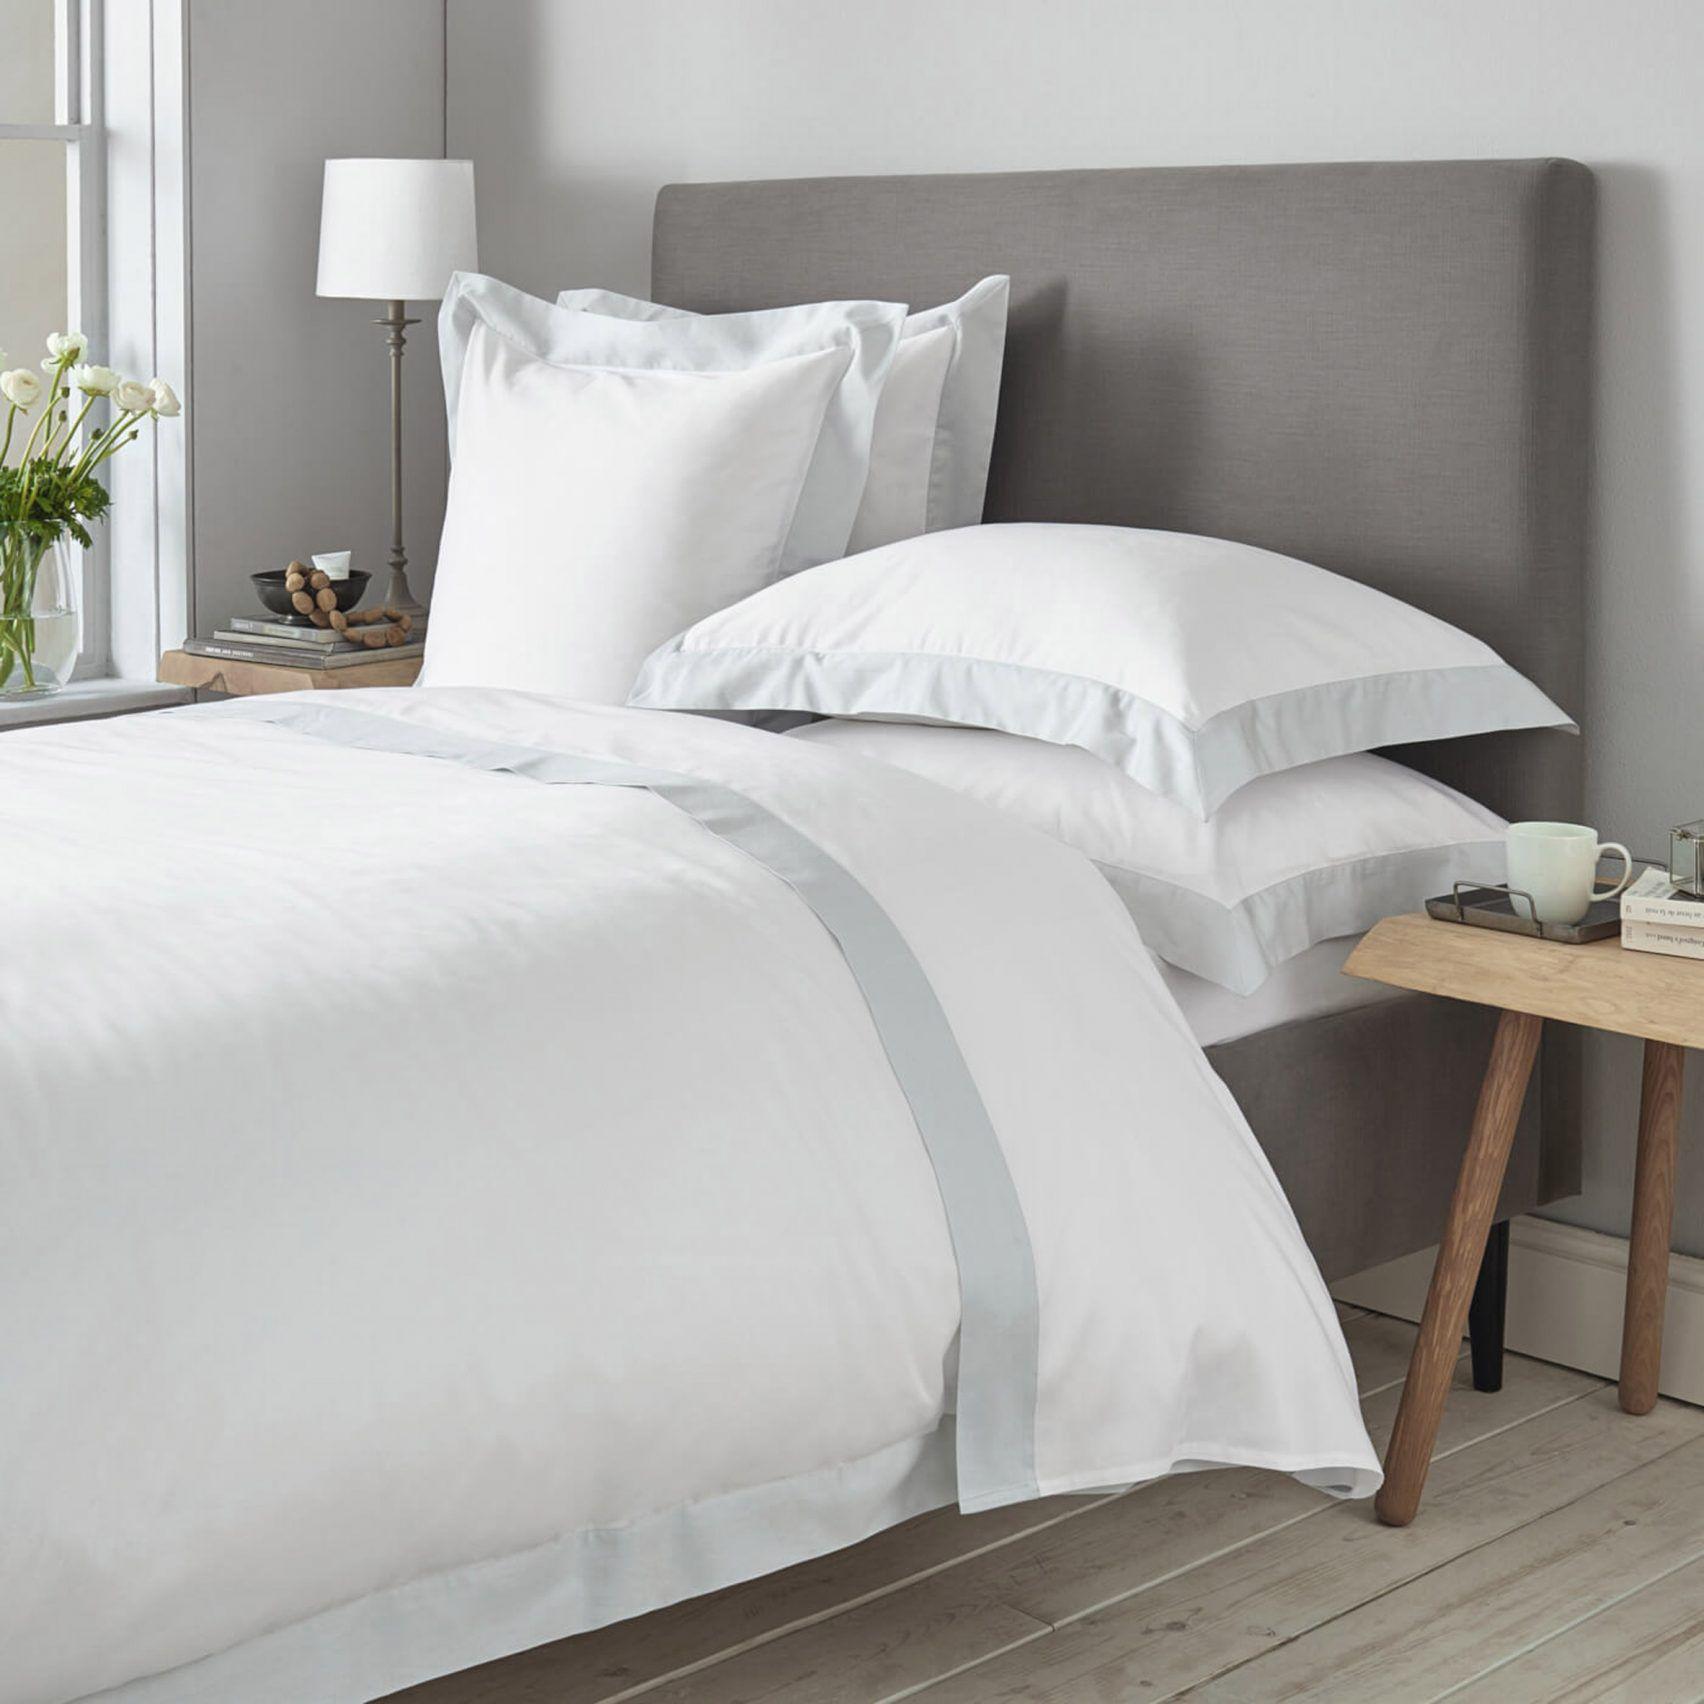 camborne-bed-linen-1528730270